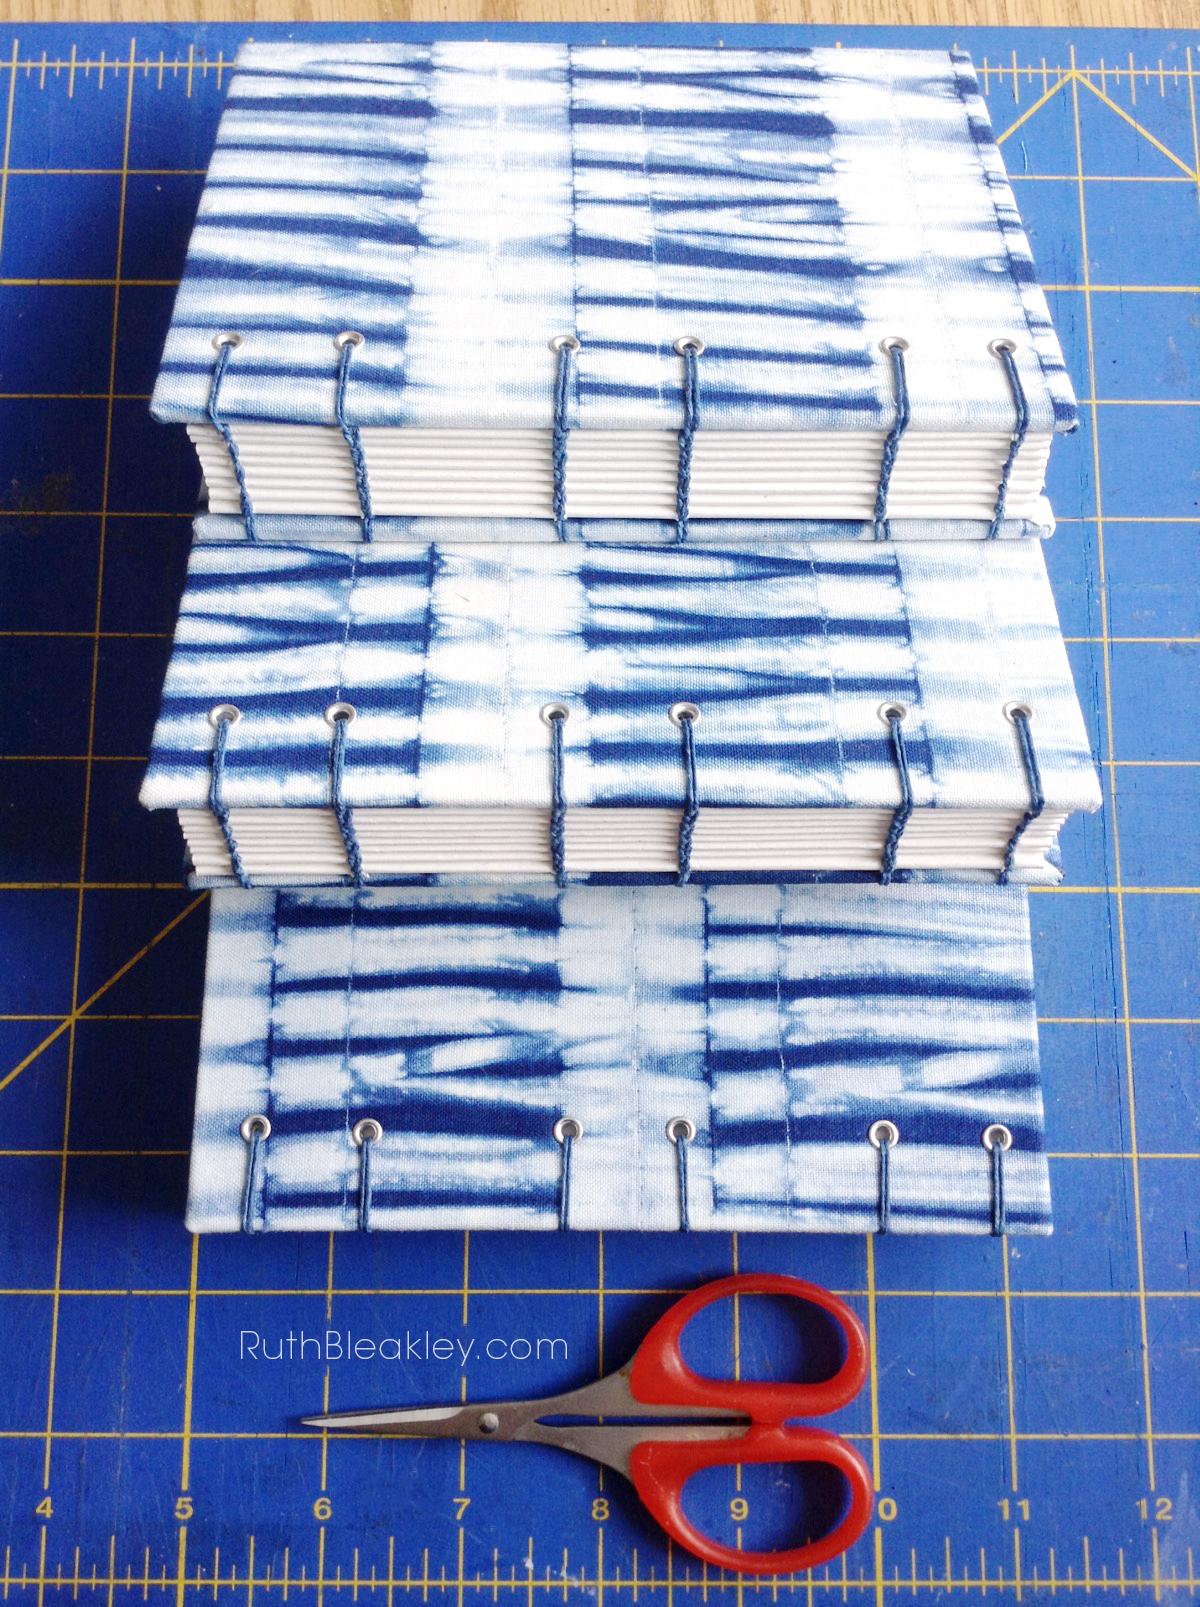 Shibori Handmade Journals in Progress by bookbinder Ruth Bleakley - 6